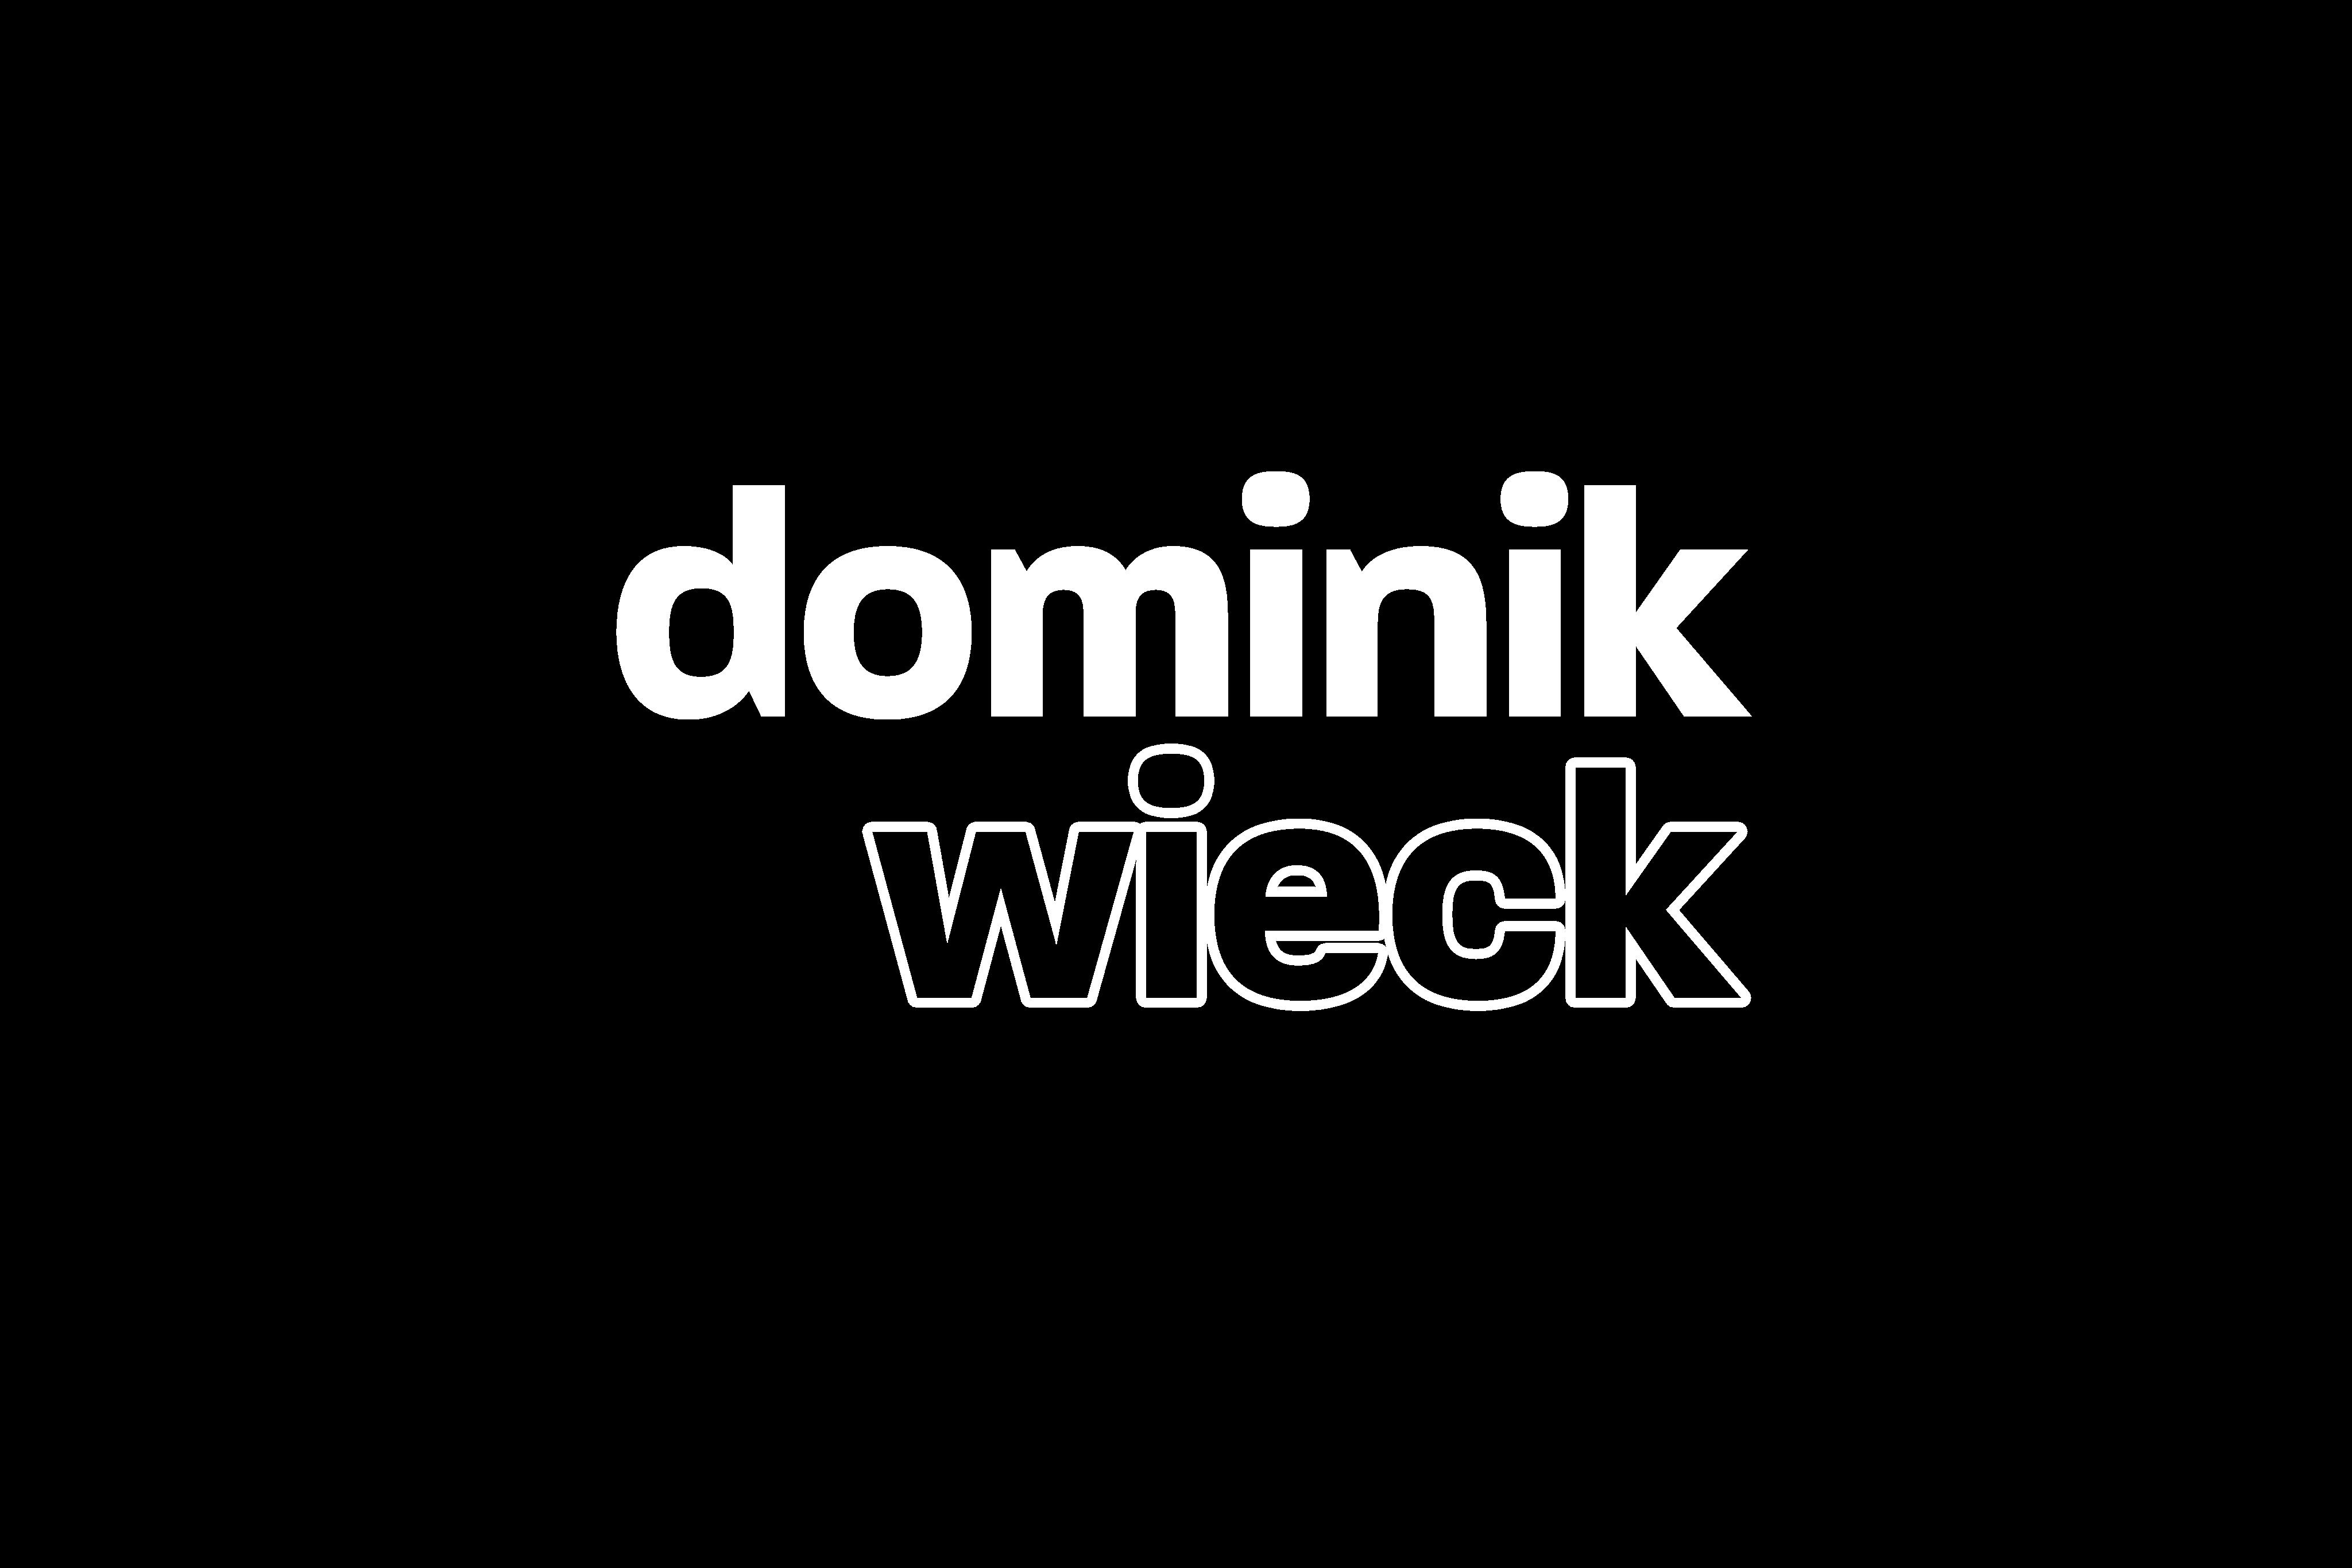 Dominik Wieck